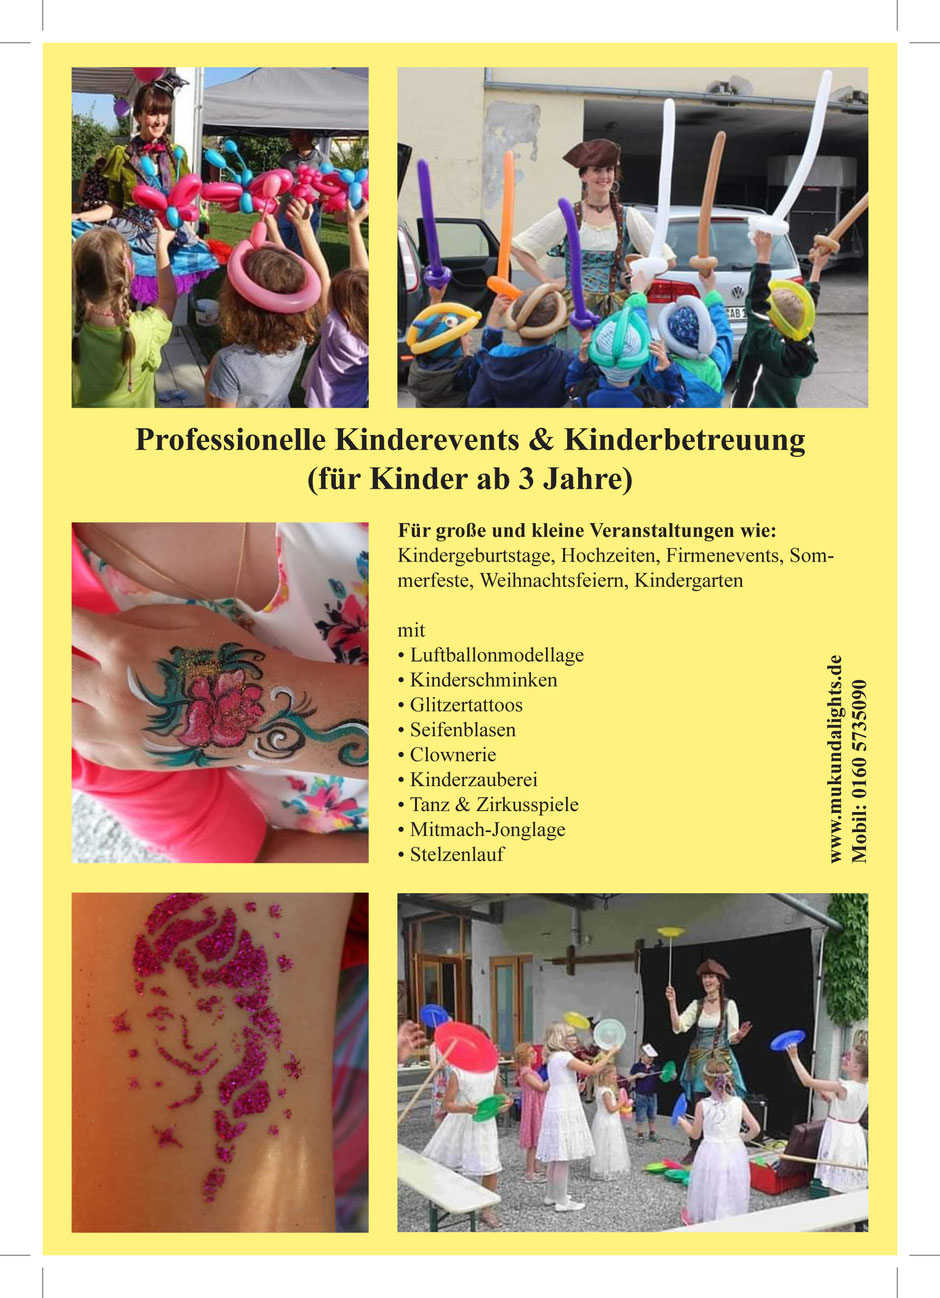 Kinderbetreuung Ingolstadt, Kindergrogrammm, Kinderworkshops